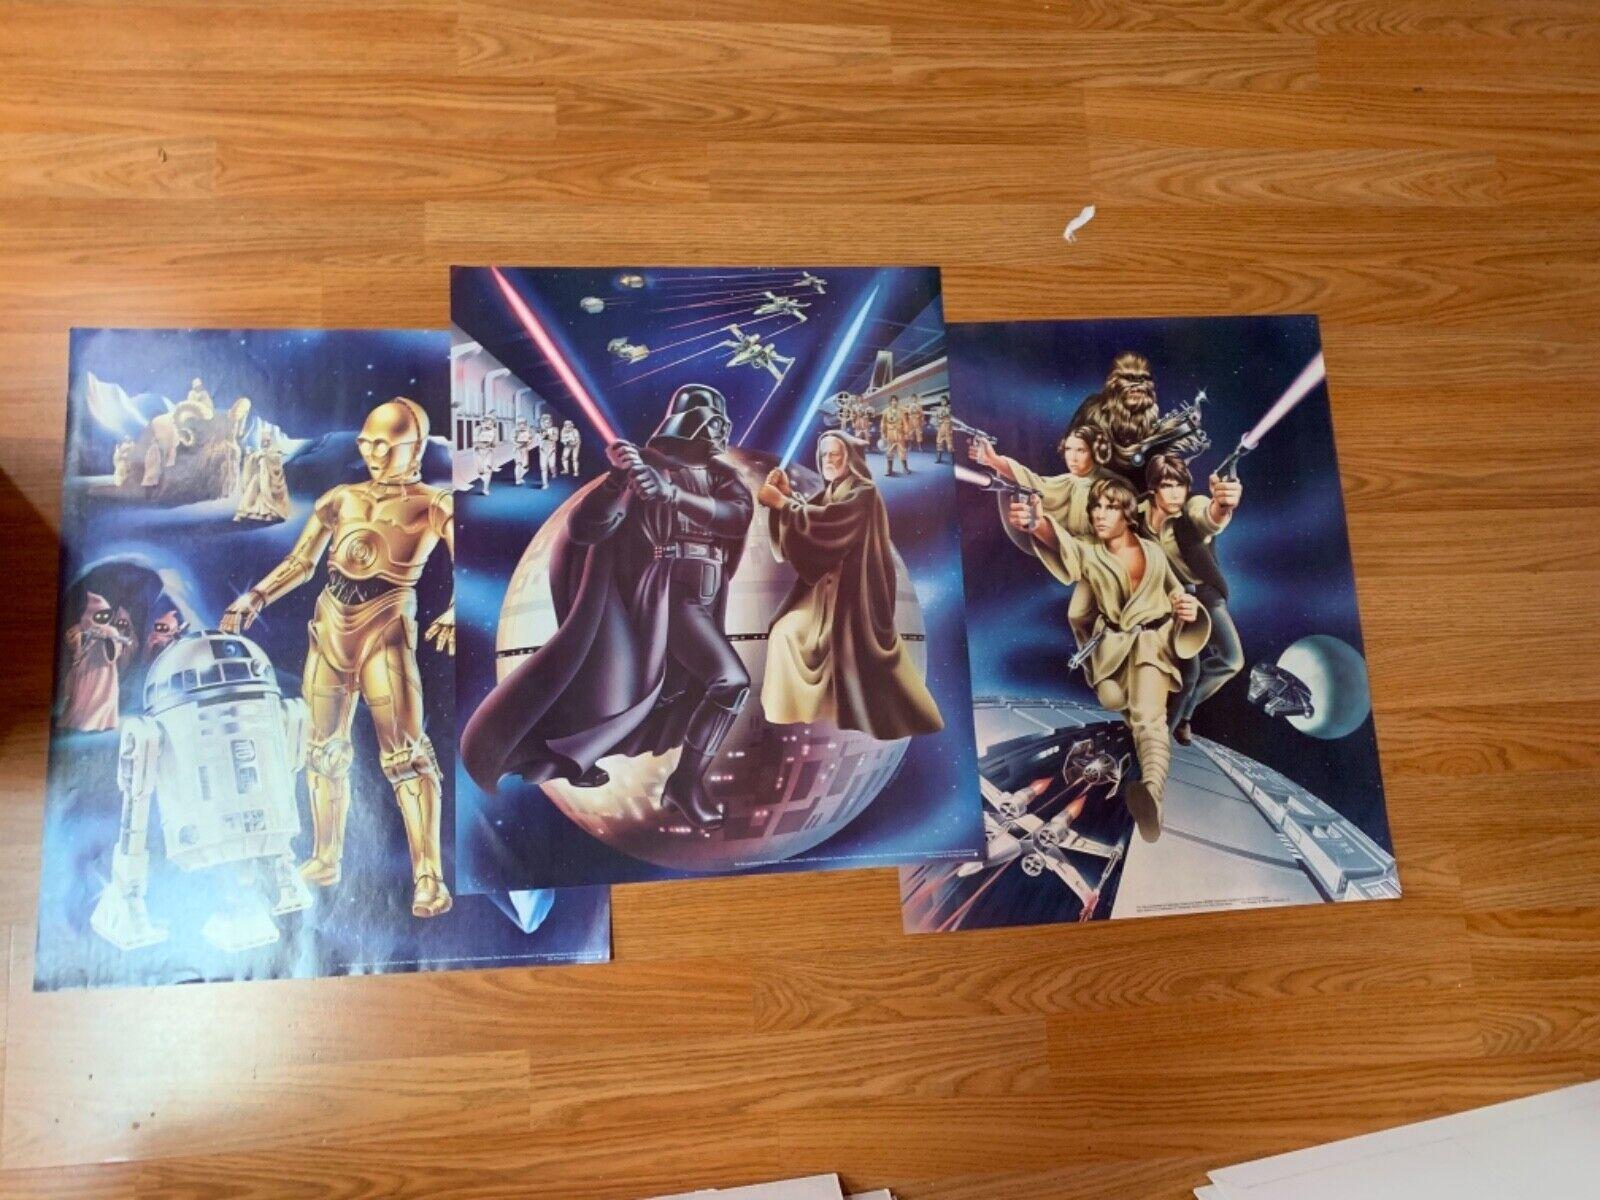 Star Wars Original Proctor & Gamble Poster 1978 Set of 3